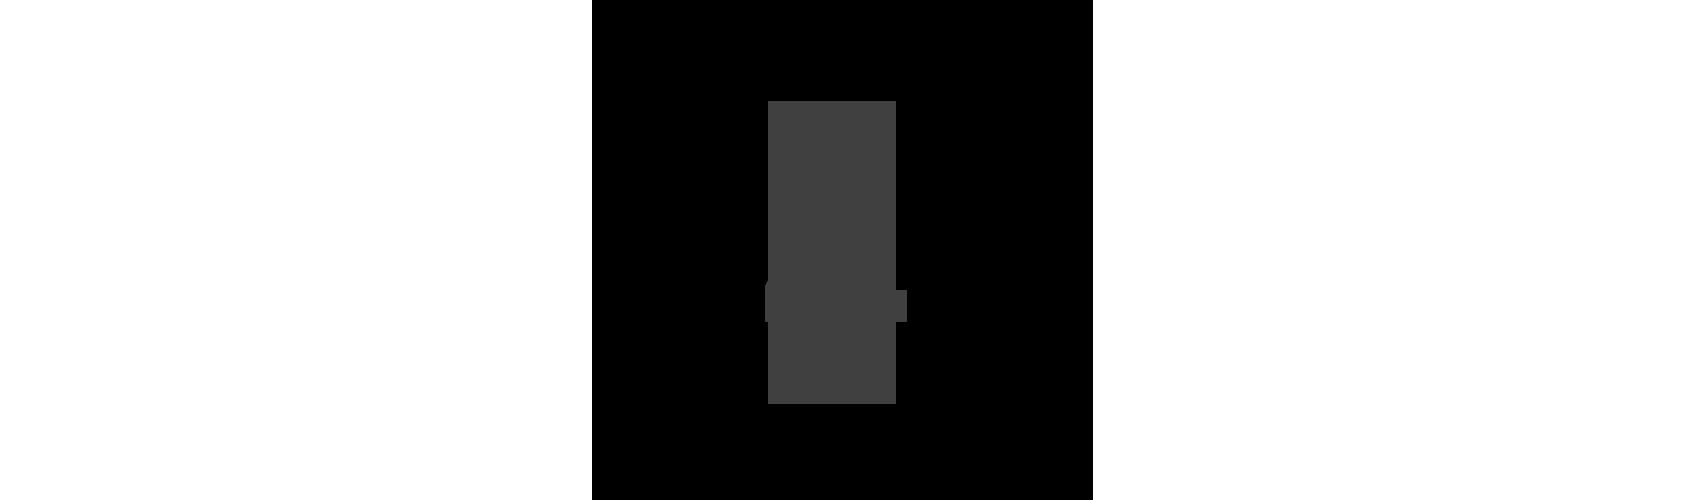 Circle 4 (Medium) copy.png